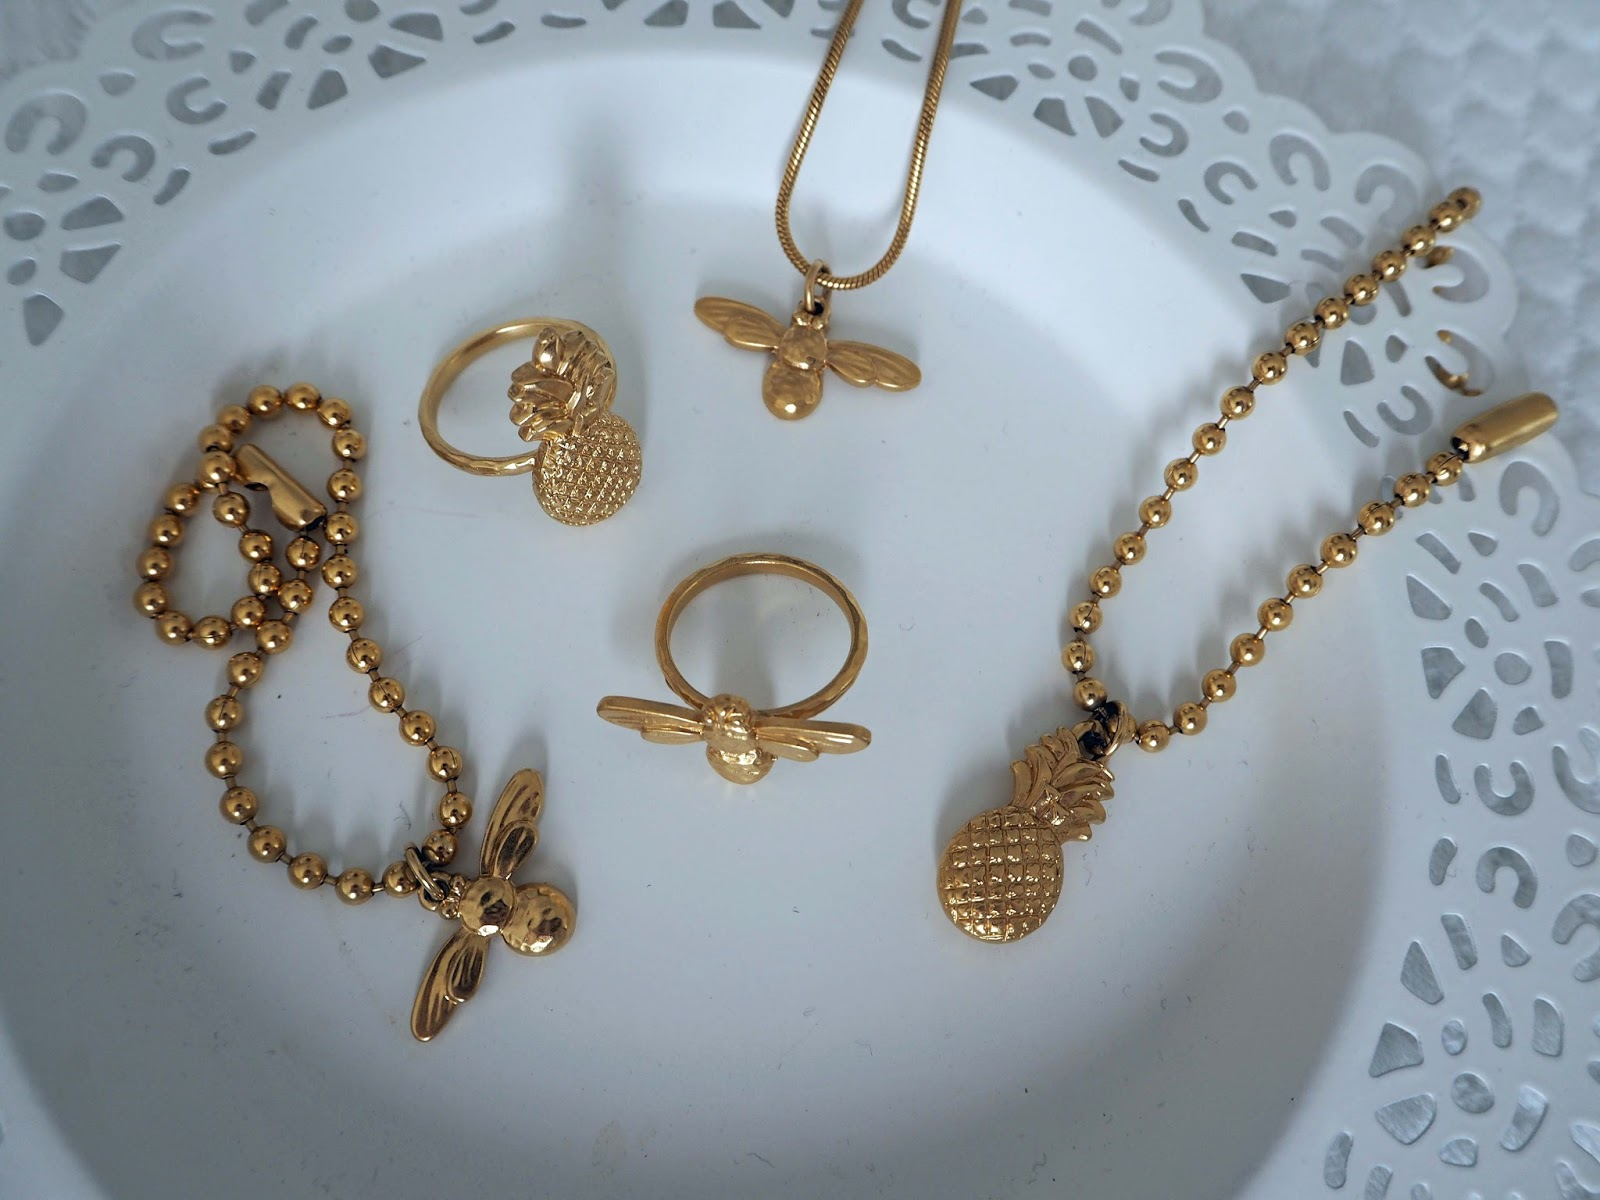 Nerja-holiday-packing-bee-pineapple-Danon-jewellery